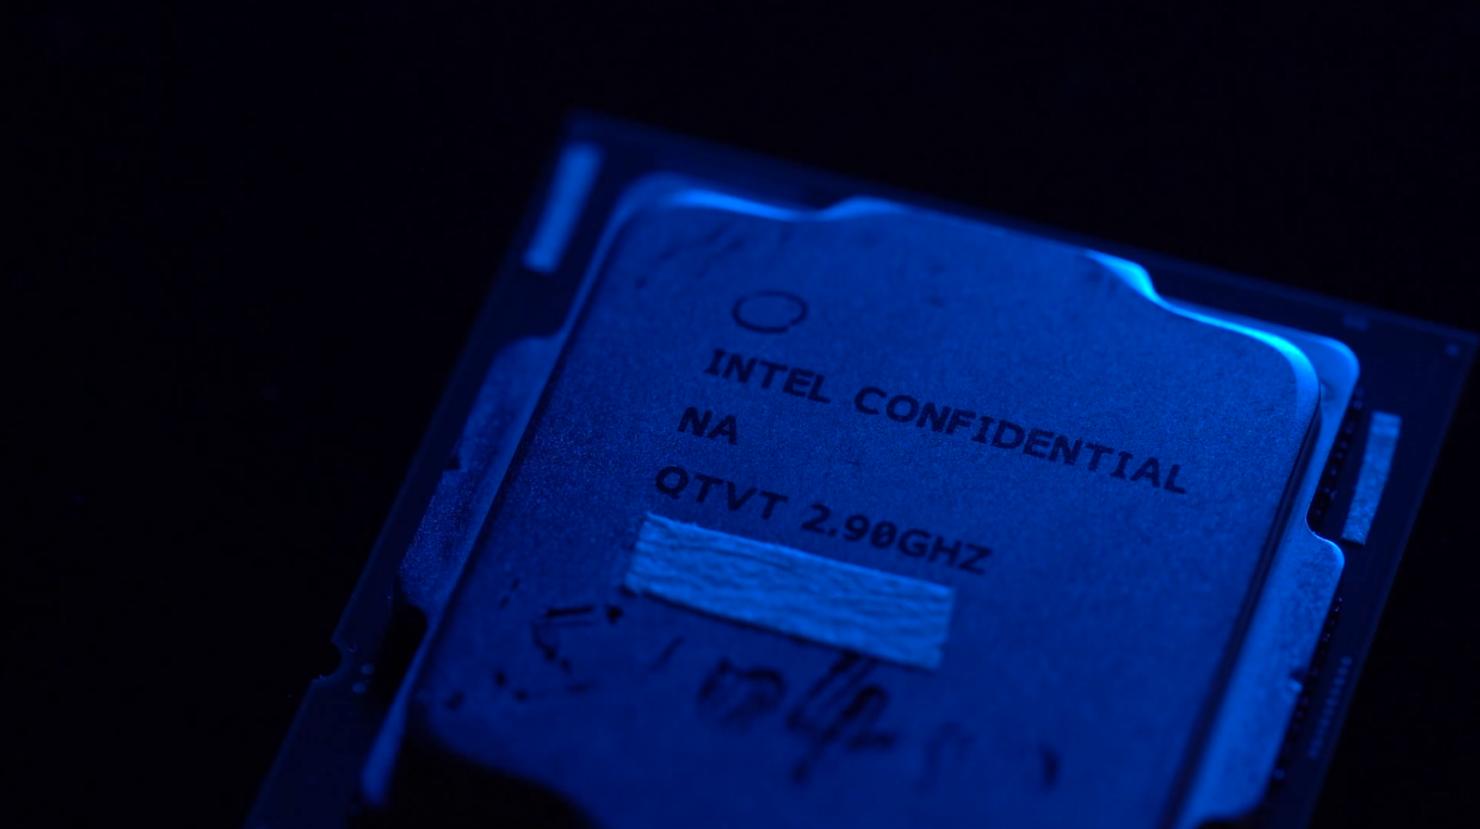 intel-core-i5-10400-comet-lake-s-6-core-desktop-cpu_1